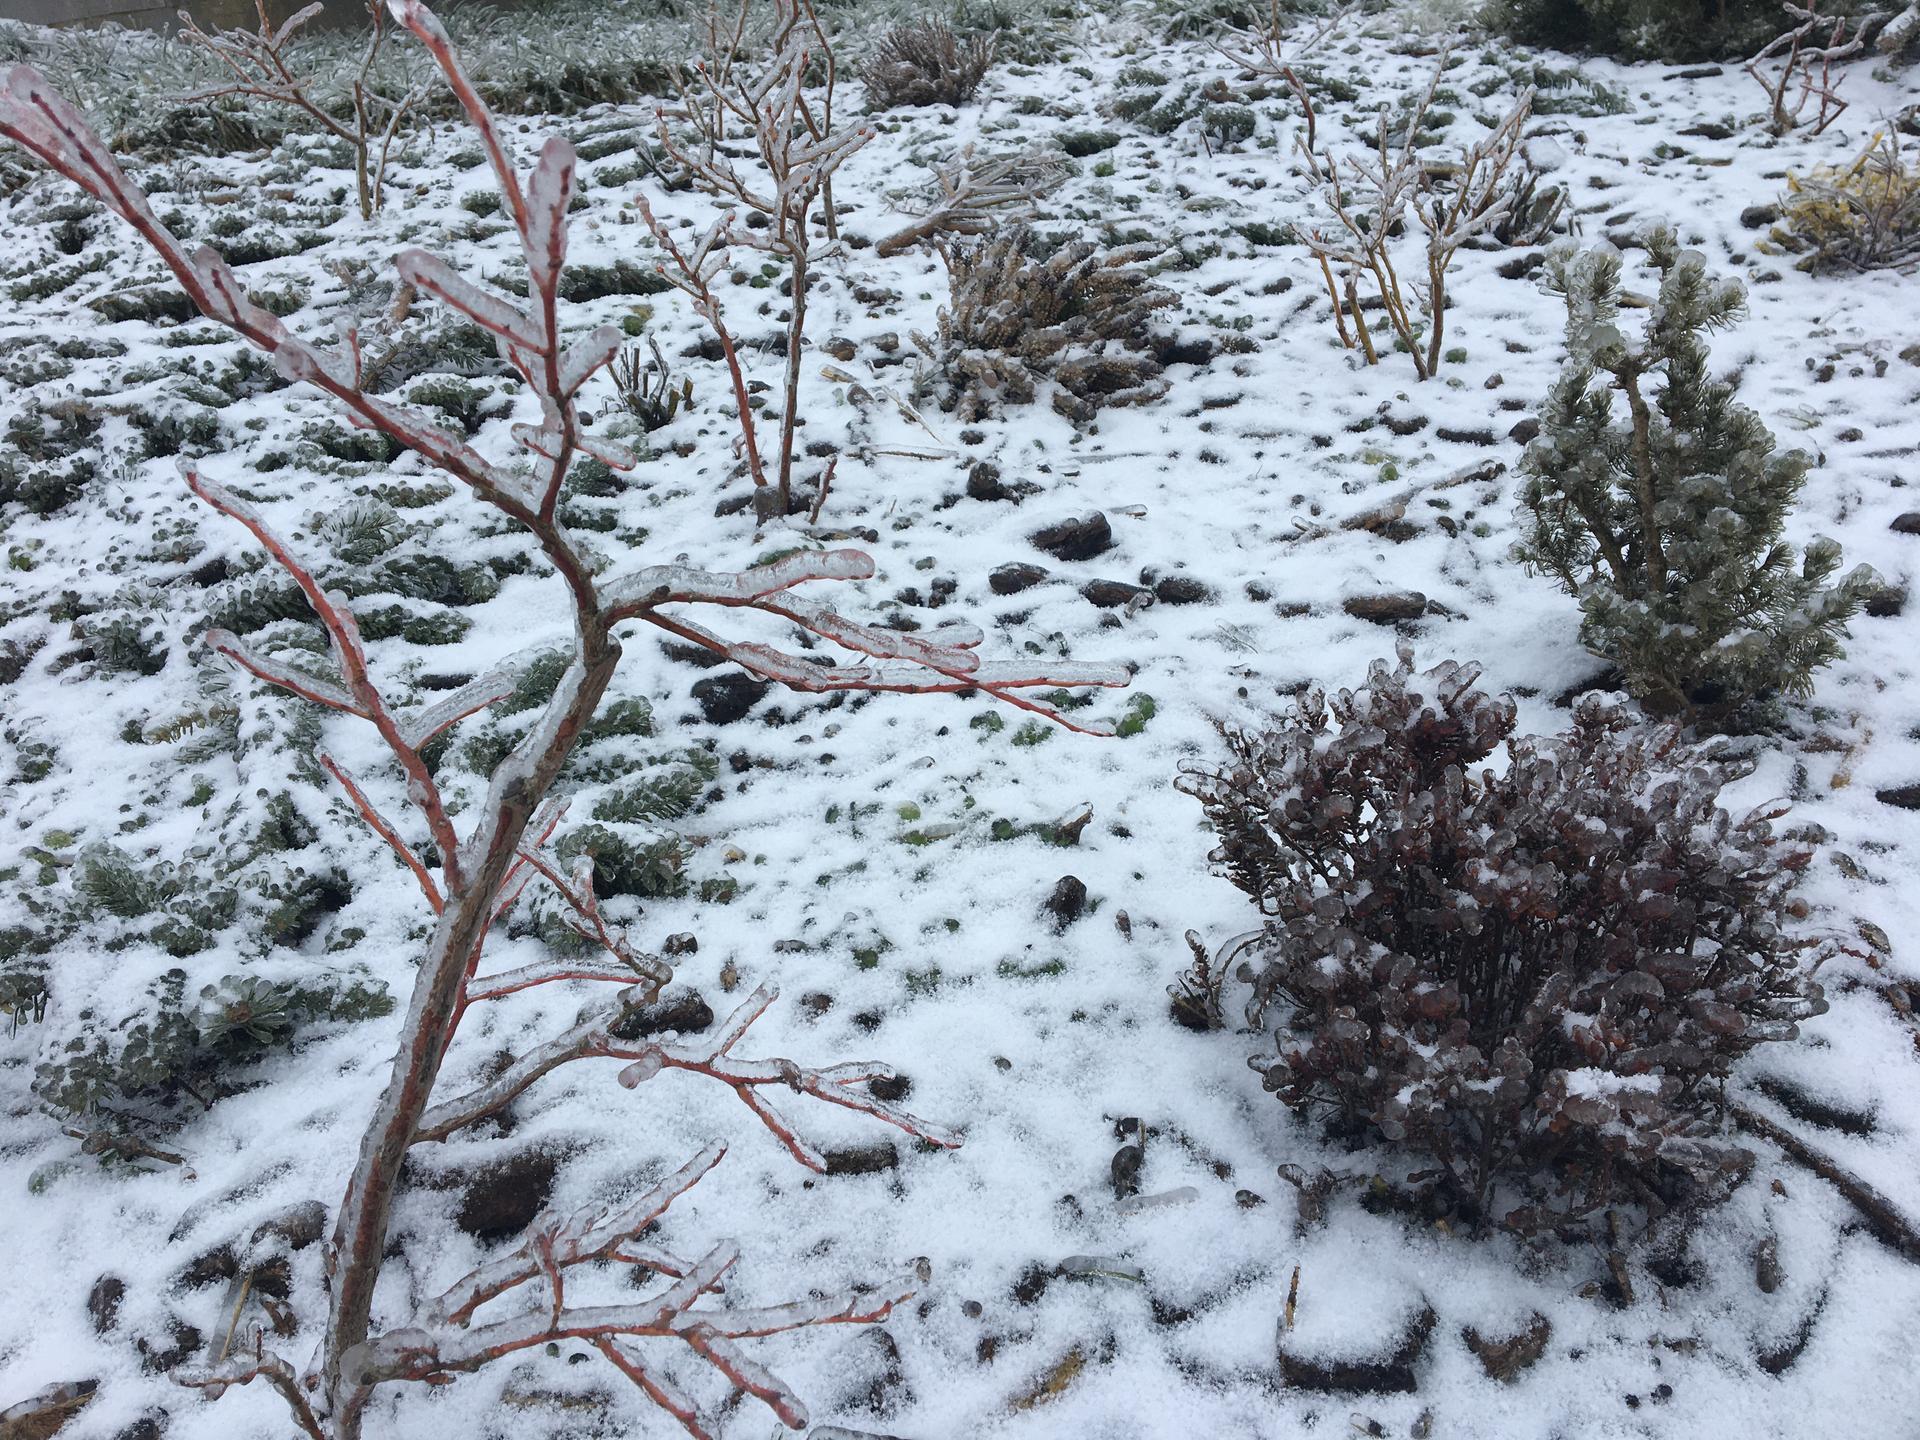 Skřítčí zahrada 2021 - Únor 2021 - vrstva ledovky